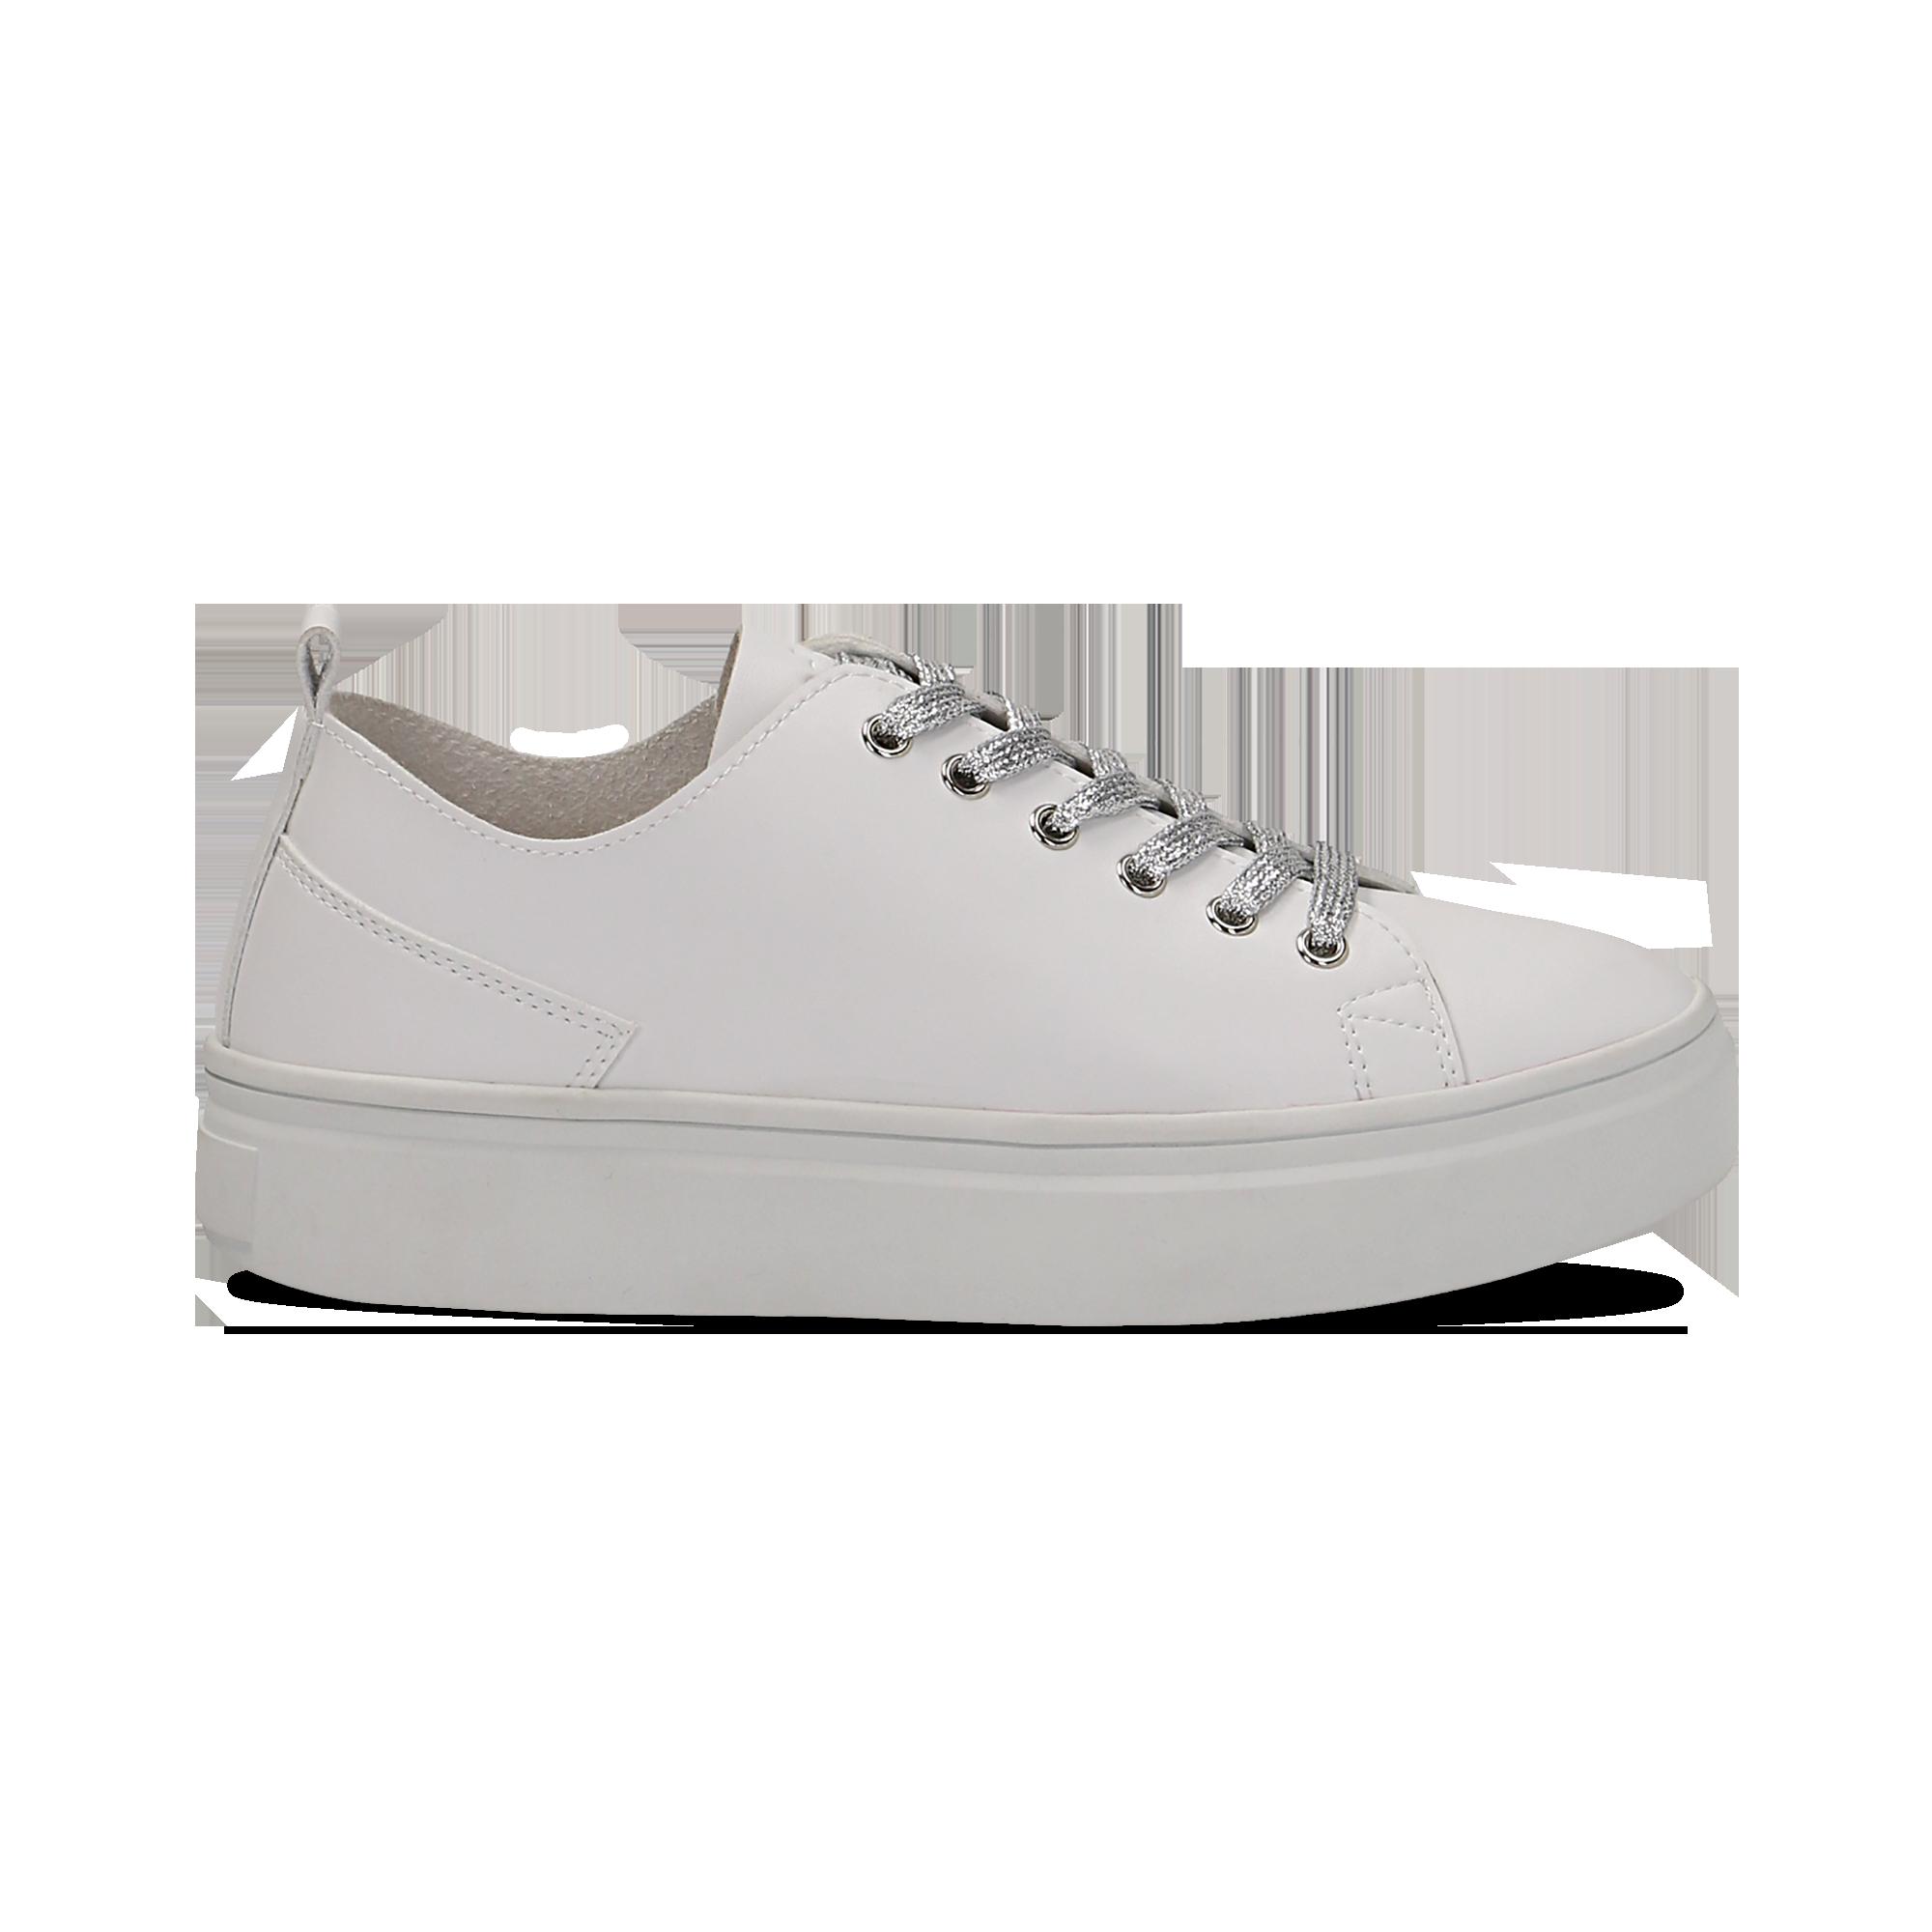 BianchePrimadonna Da Sneakers Donna Estive Collection Yb6f7gy